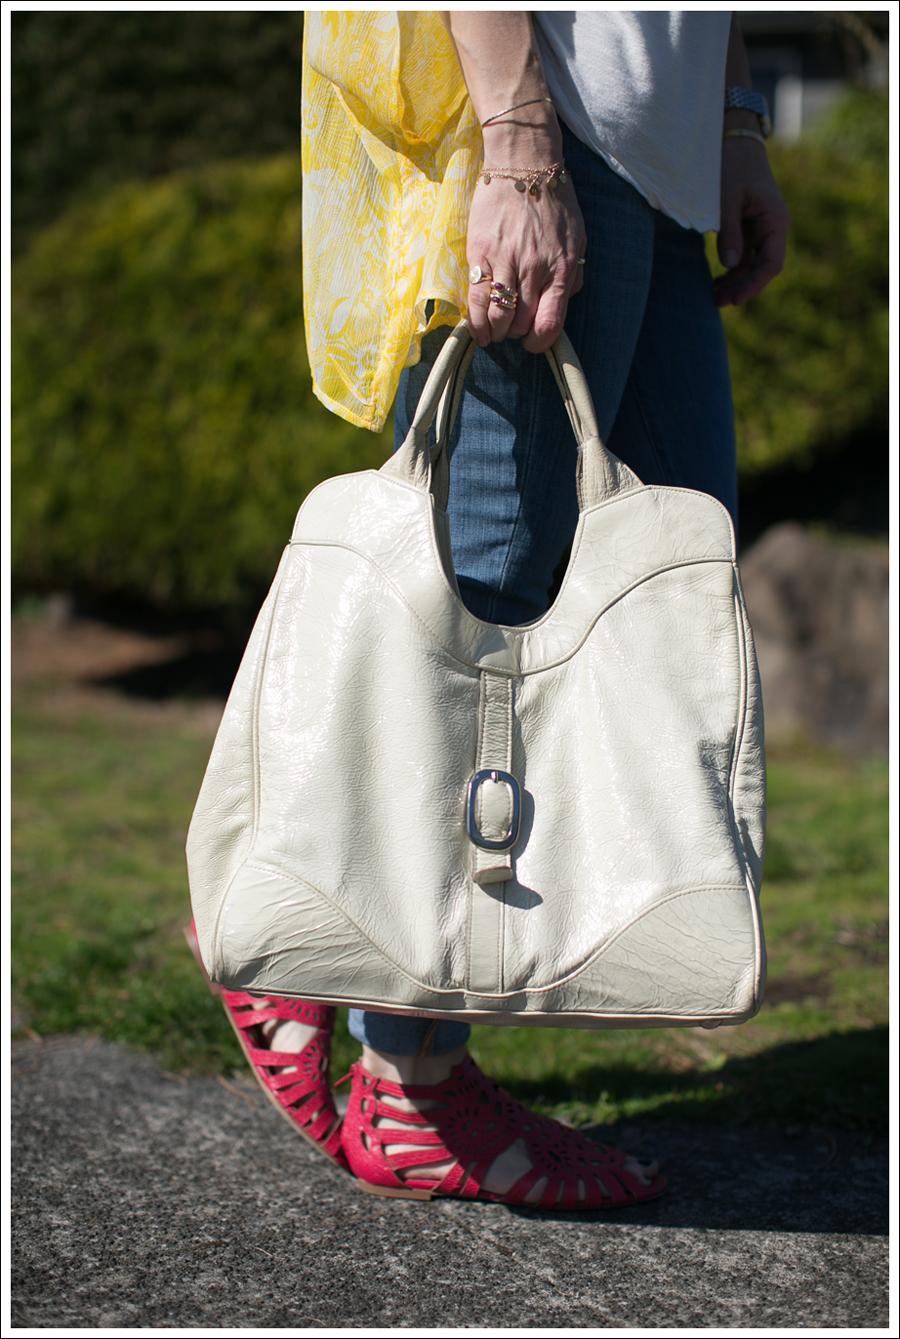 Blog Winter Kate Kimono HM Tank Genetic Denim ShoeMint Eila Sandal-4